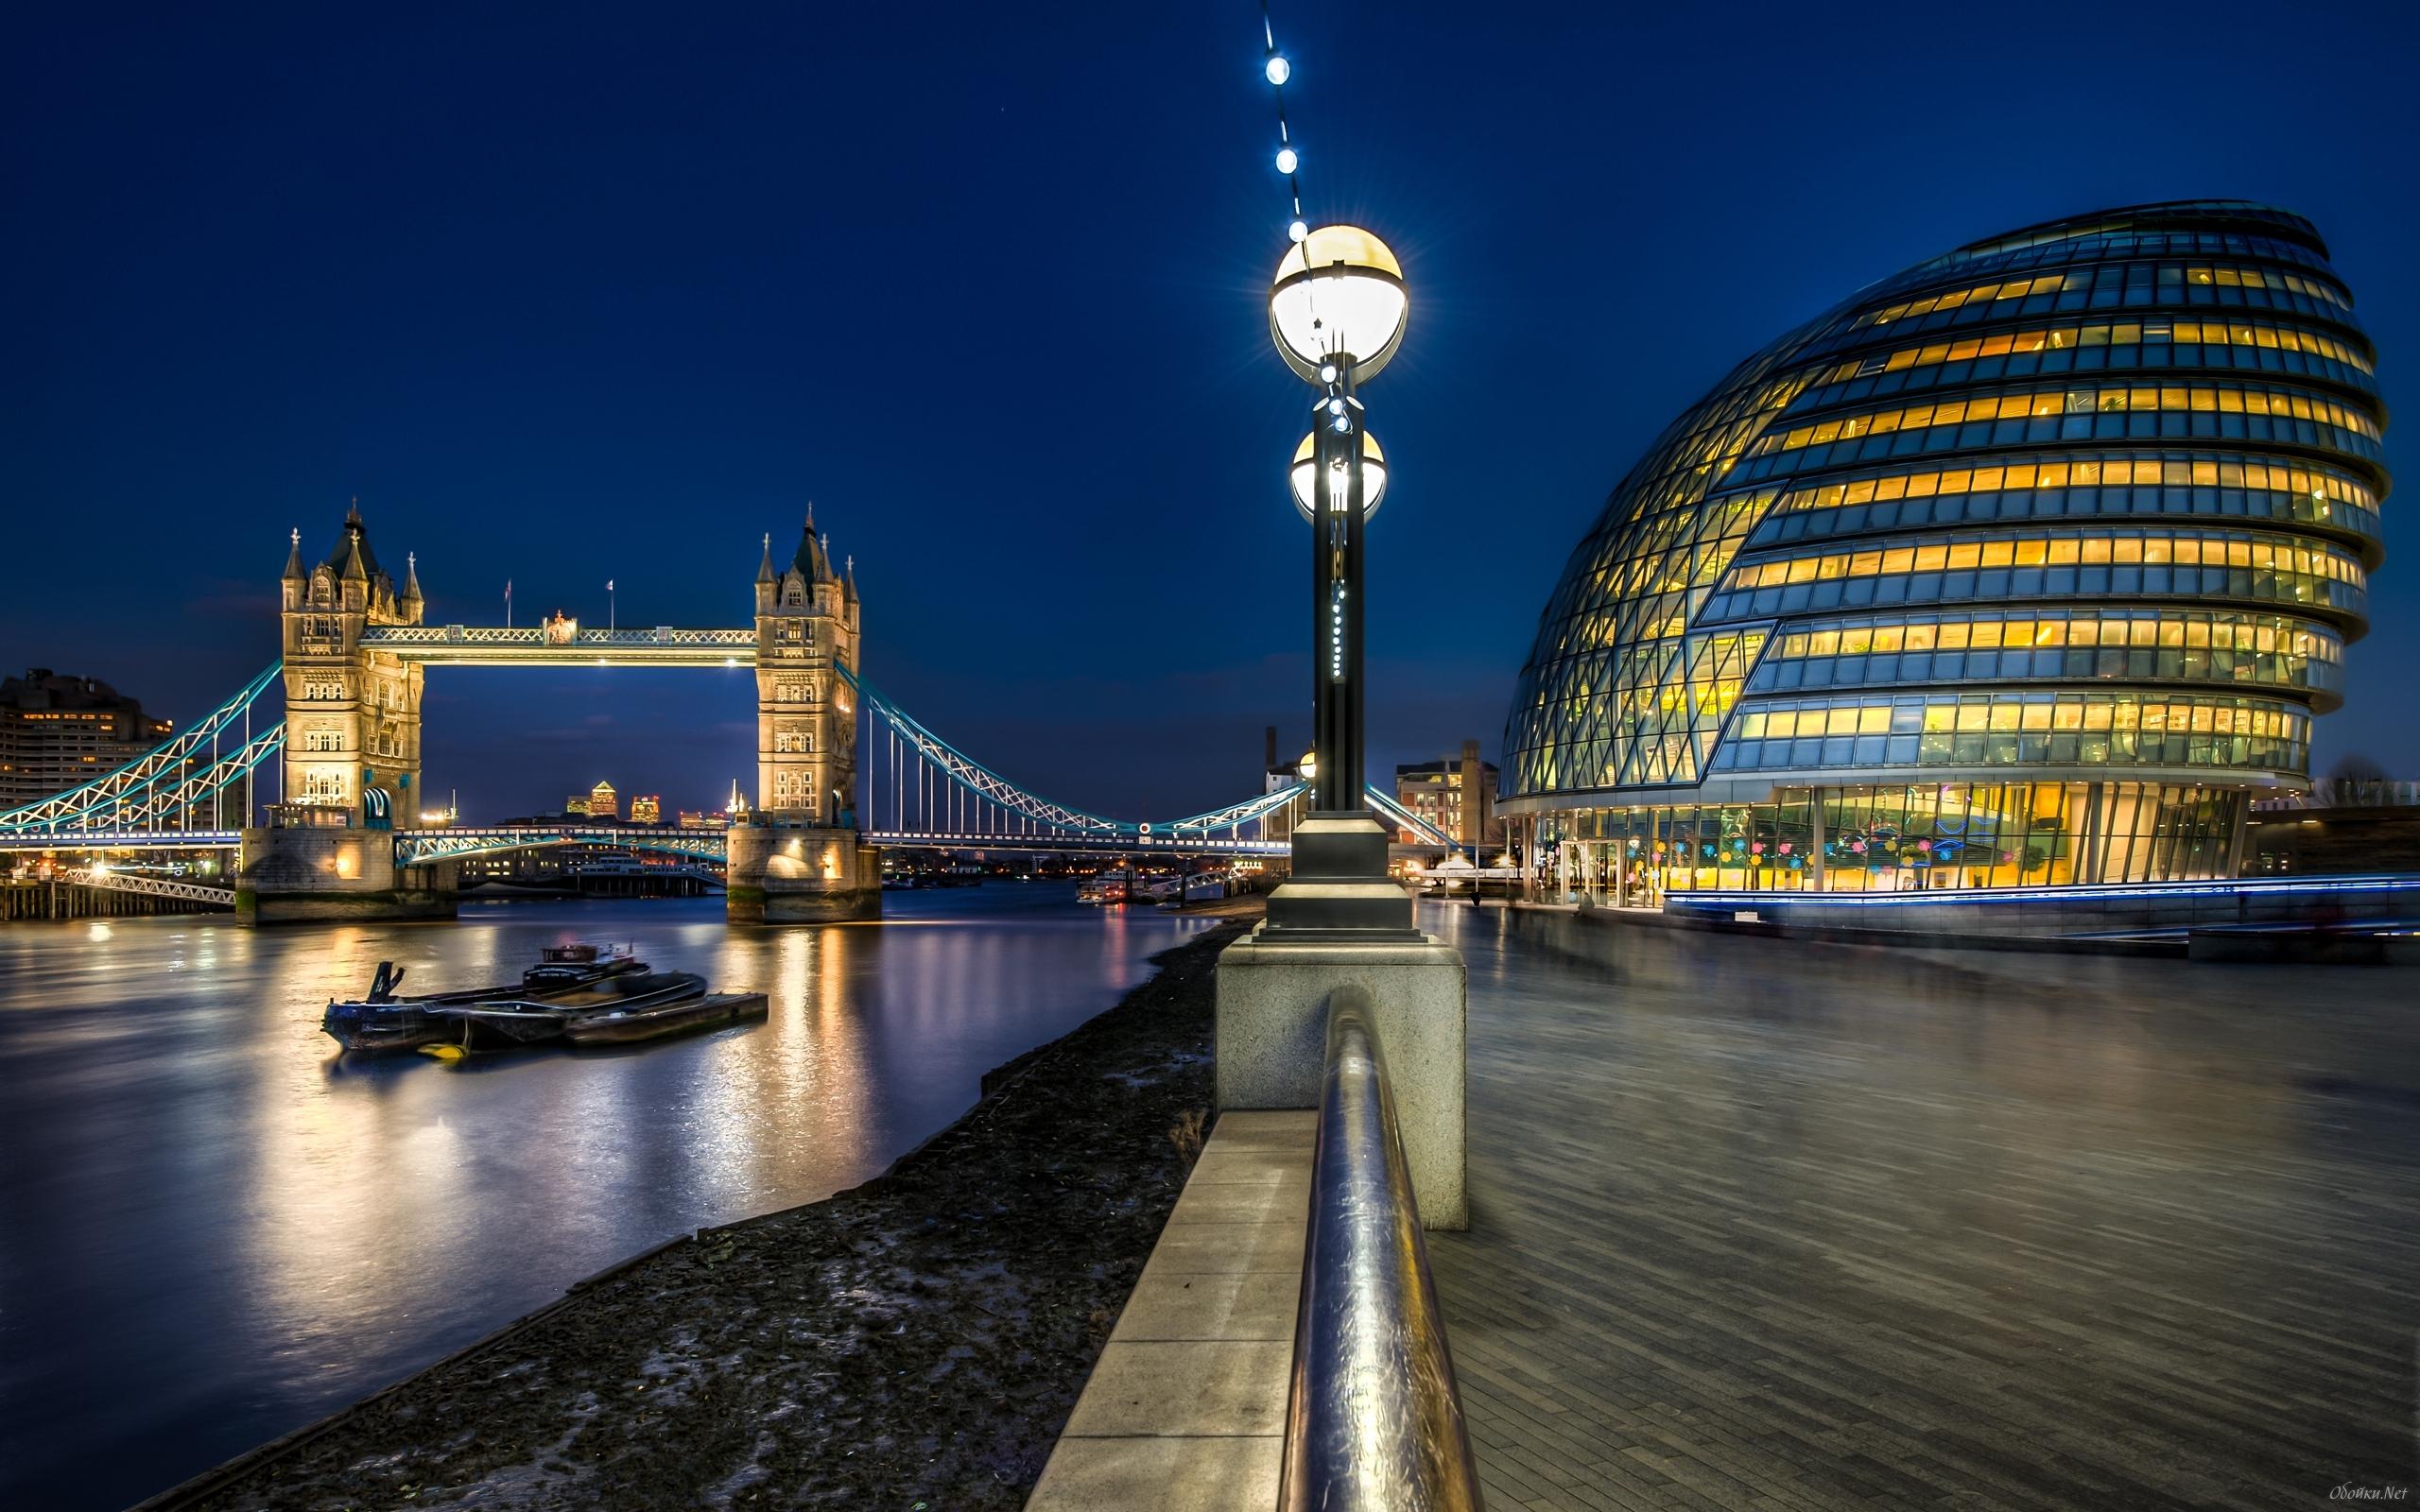 Hd wallpaper london - Lights City London Hd Desktop Wallpaper Hd Desktop Wallpaper